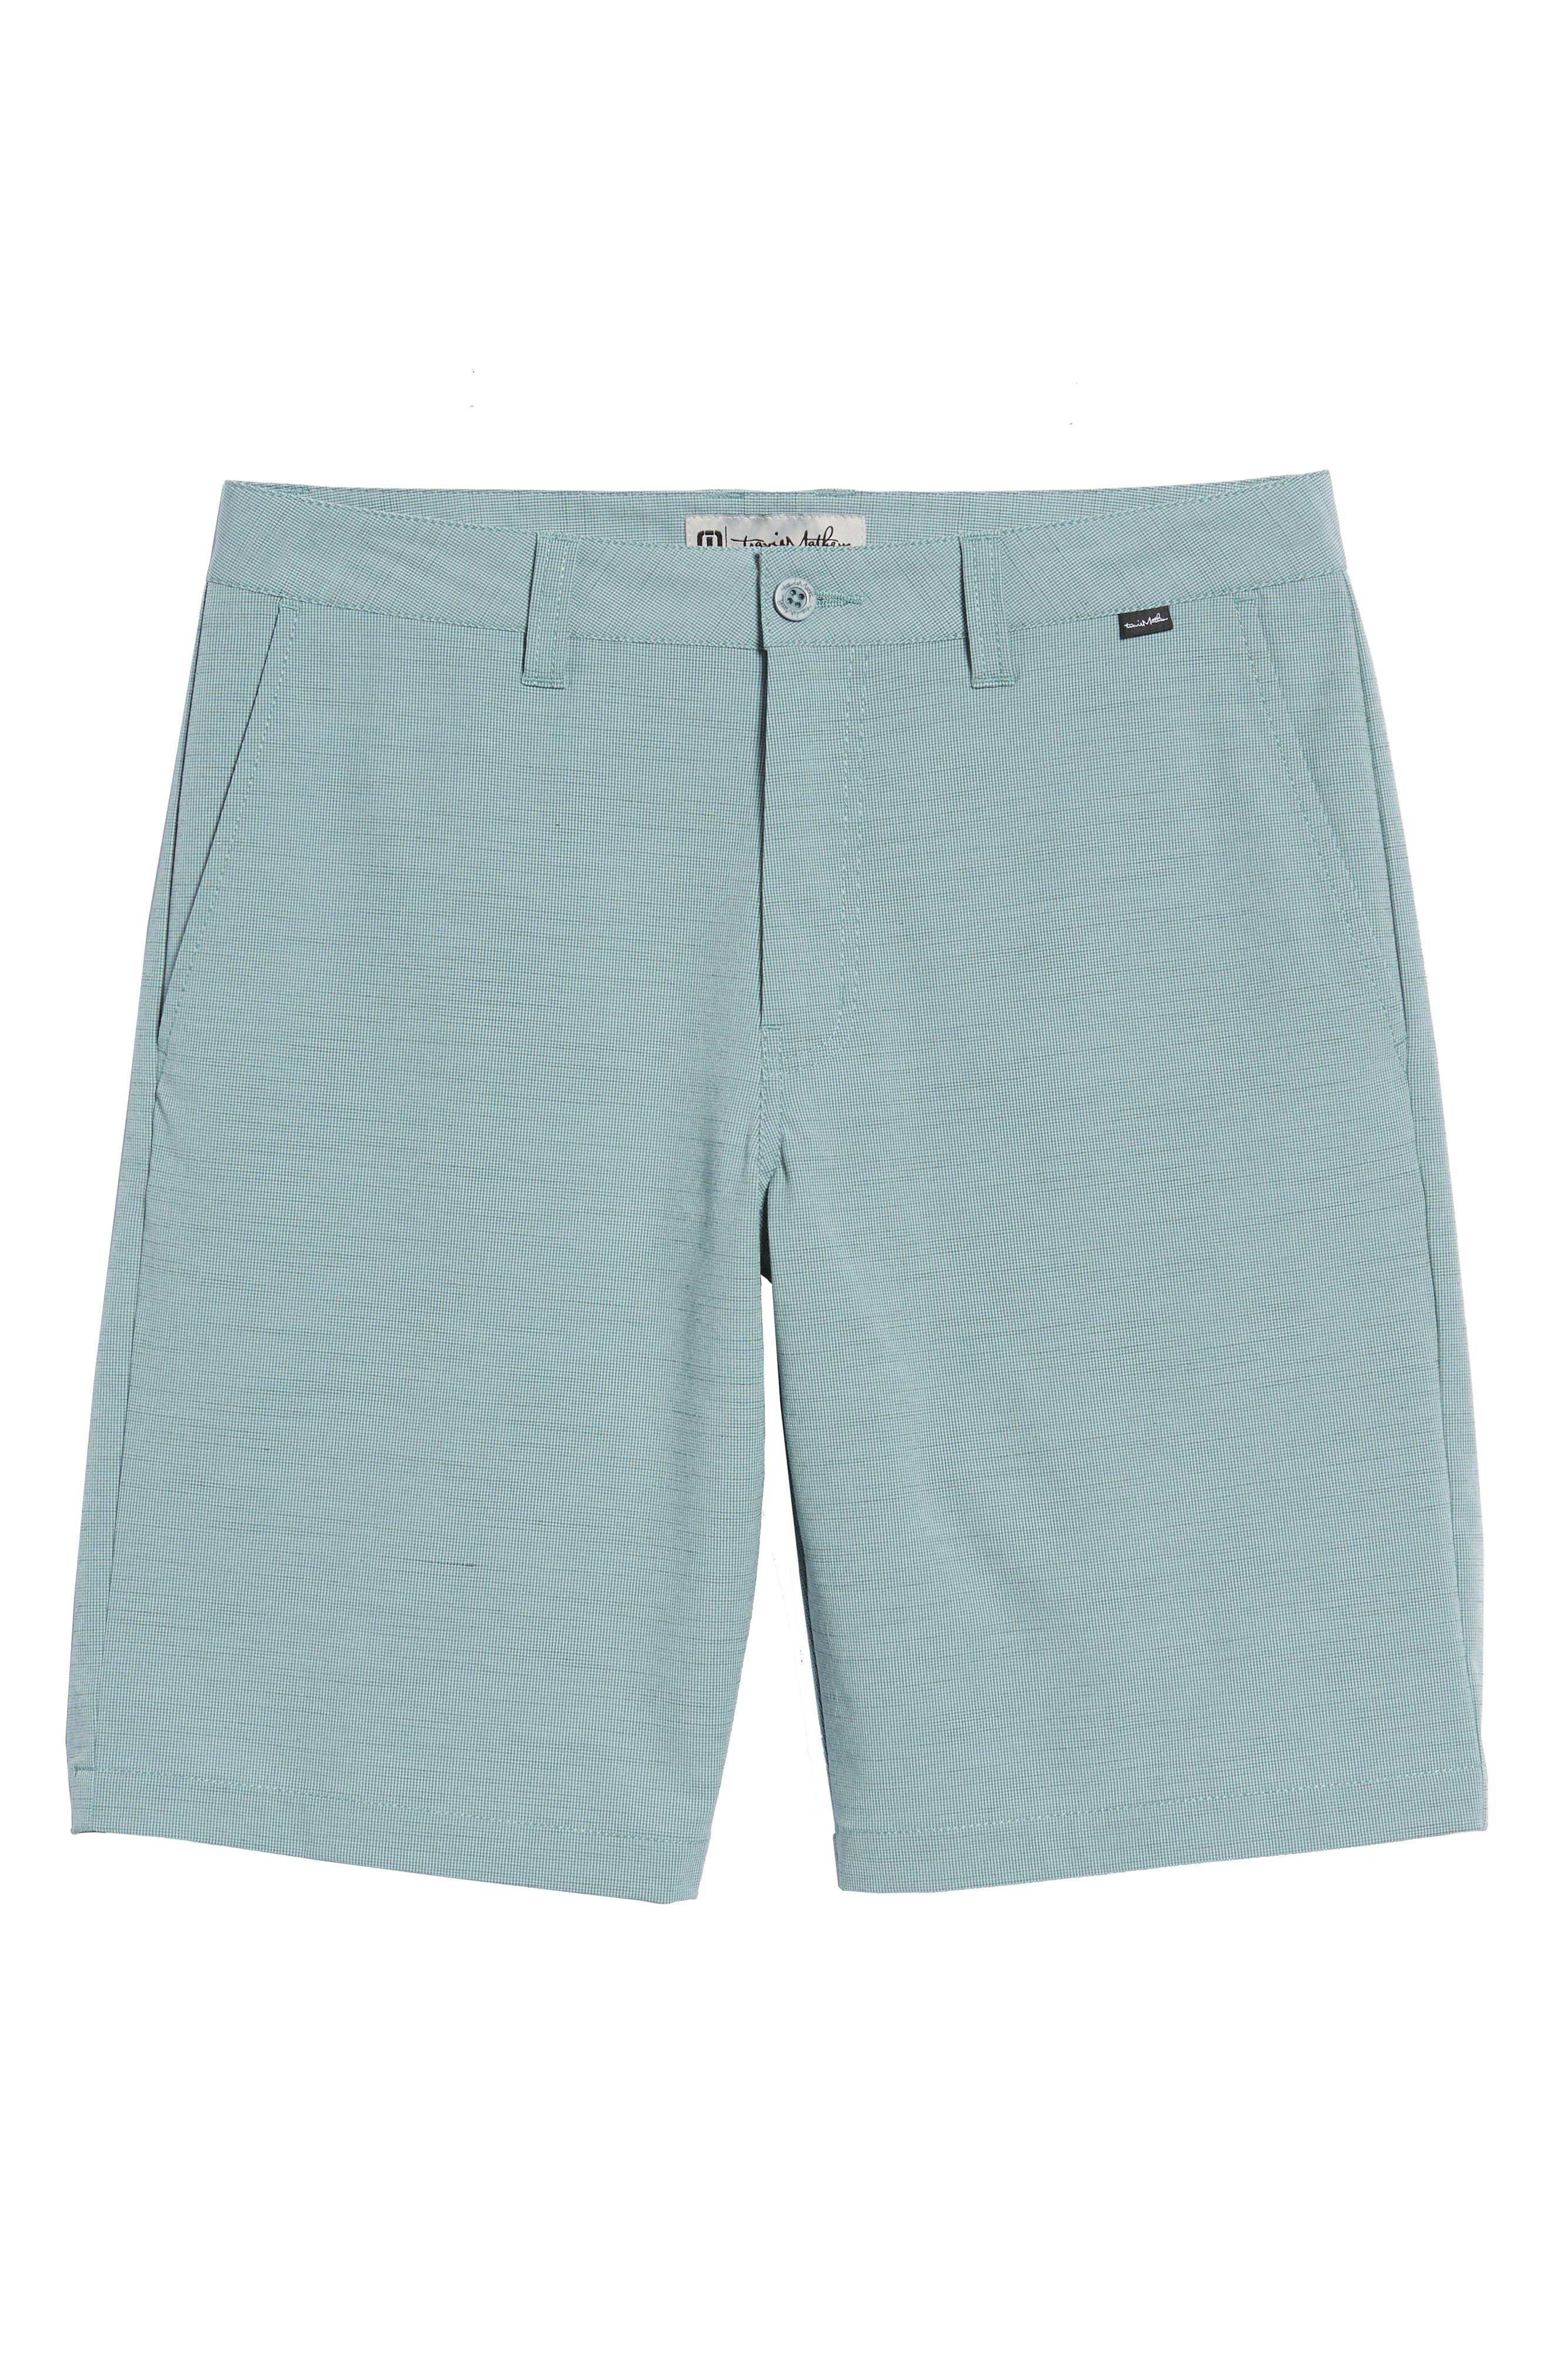 Tulum Stretch Shorts,                             Alternate thumbnail 6, color,                             Canton